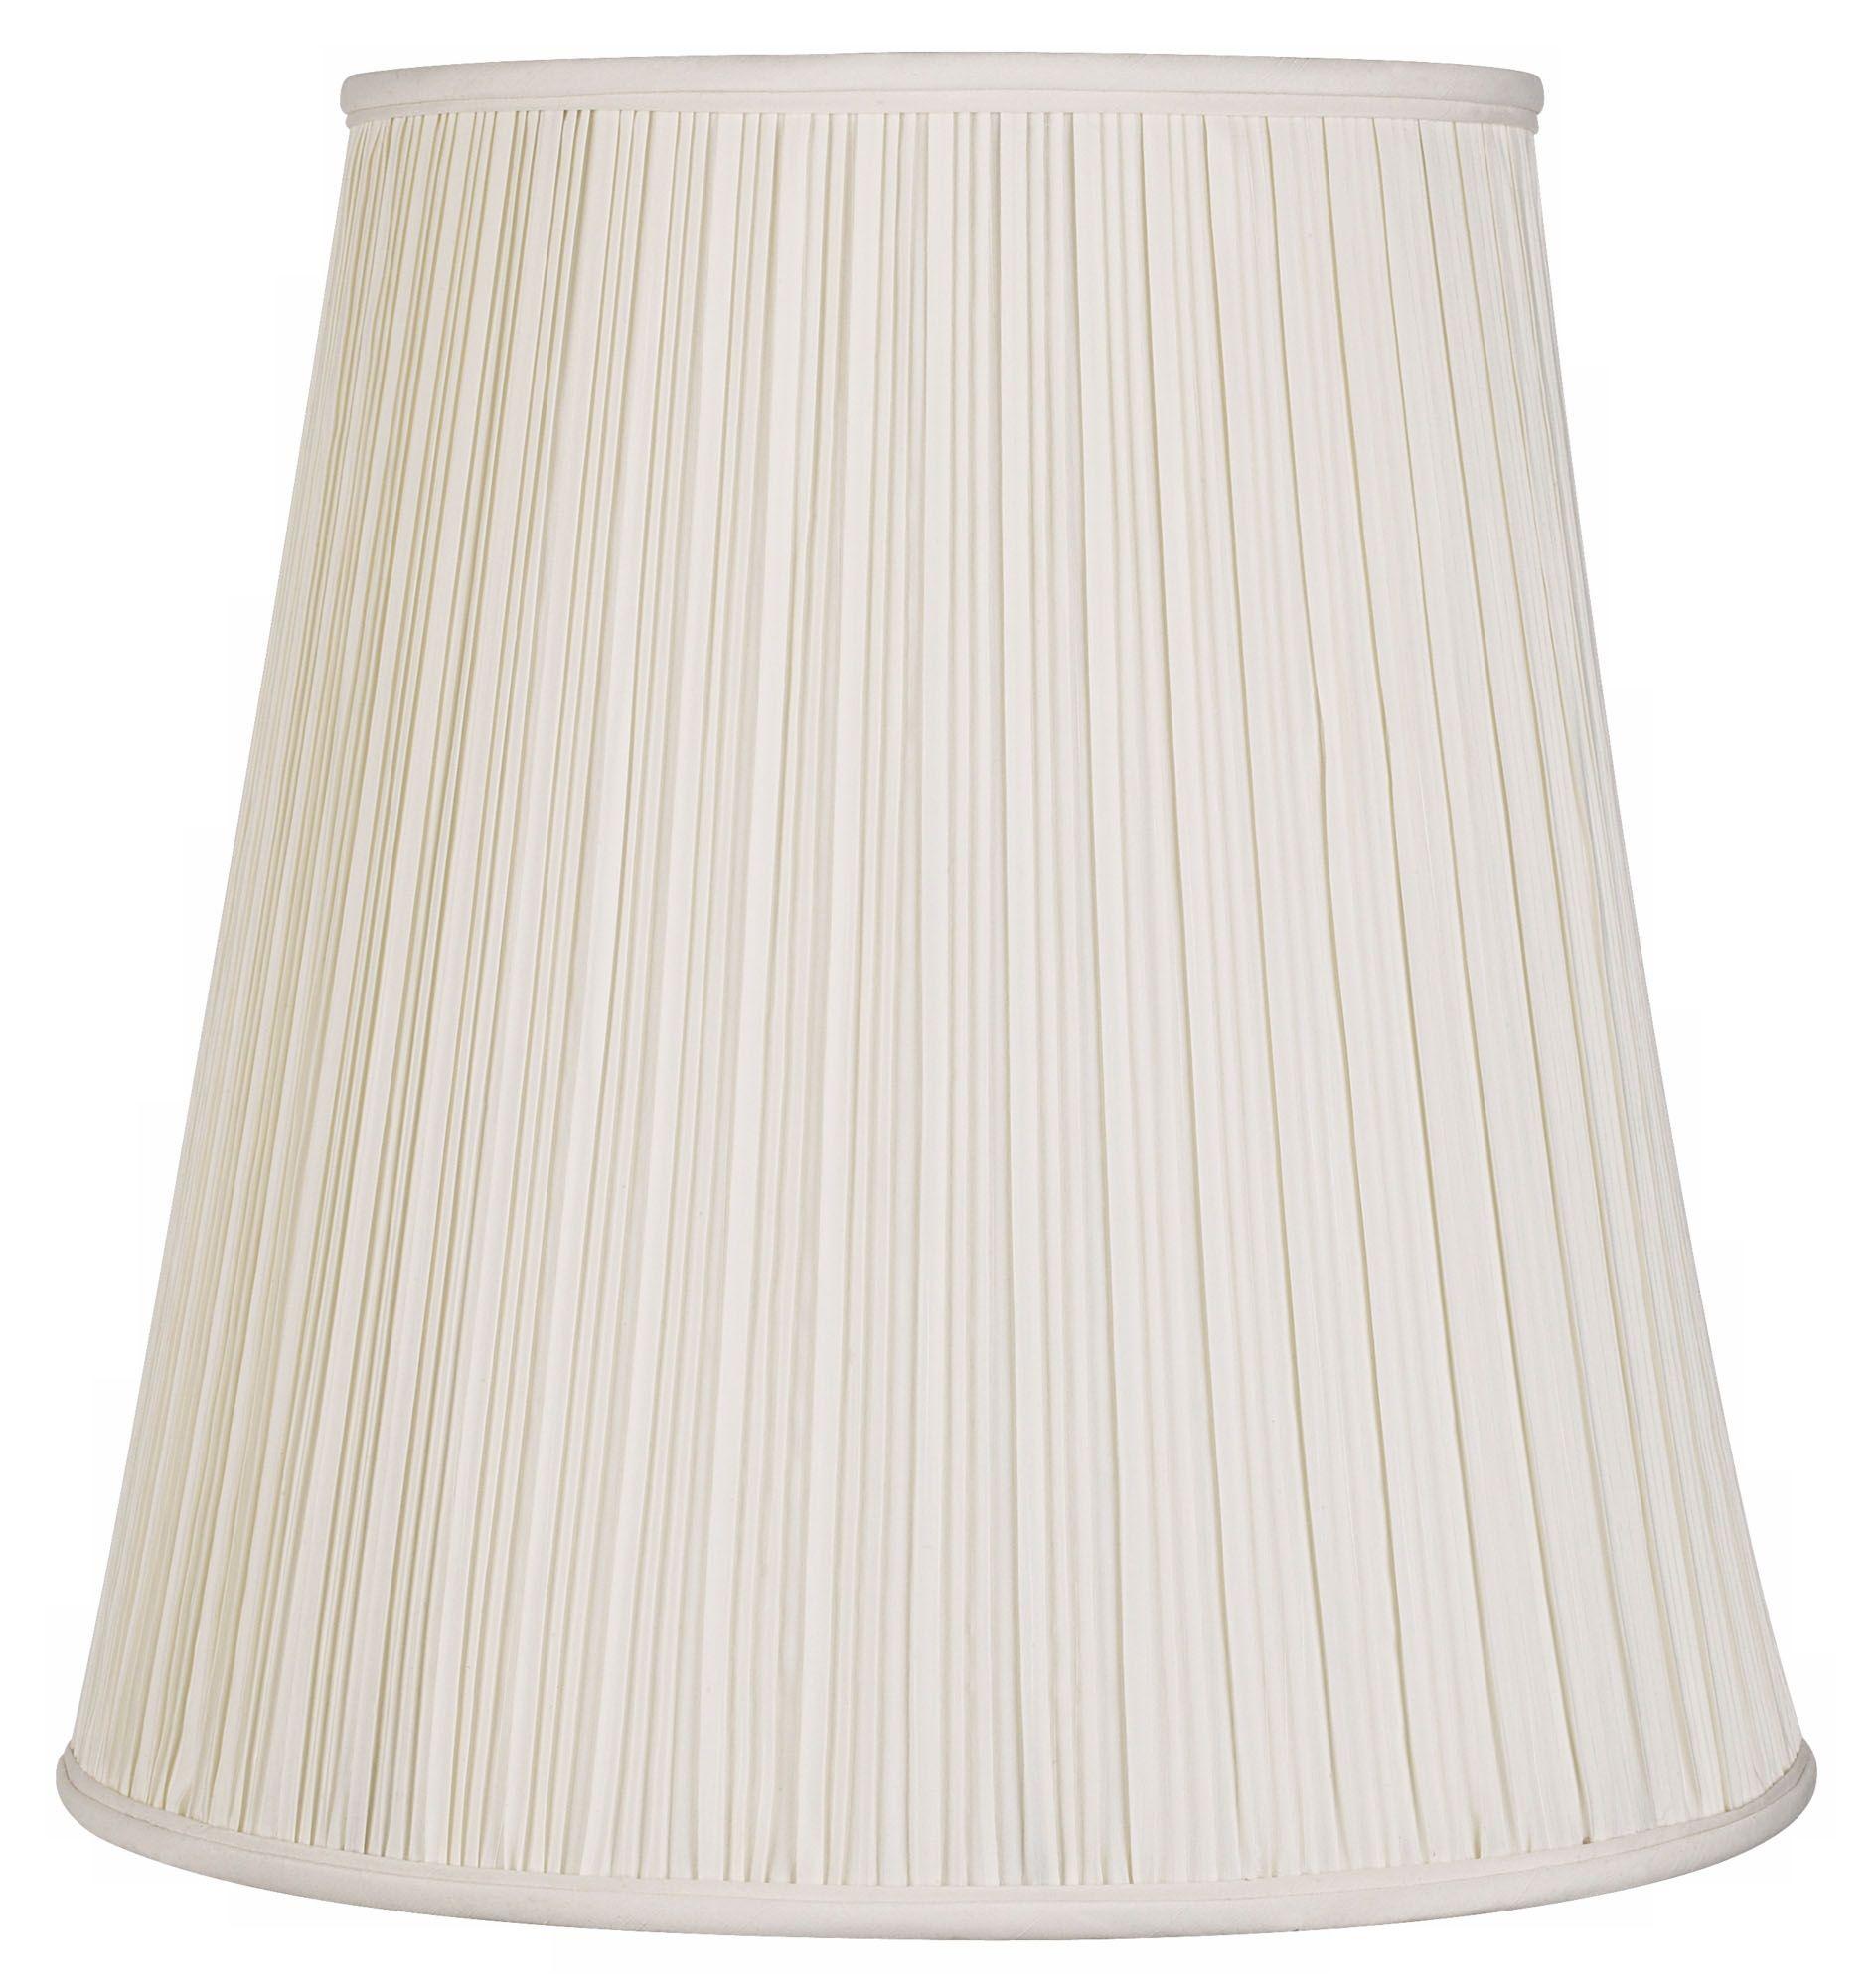 lamp shades creme mushroom pleat lamp shade 12x18x18 (spider) VAIWAMF